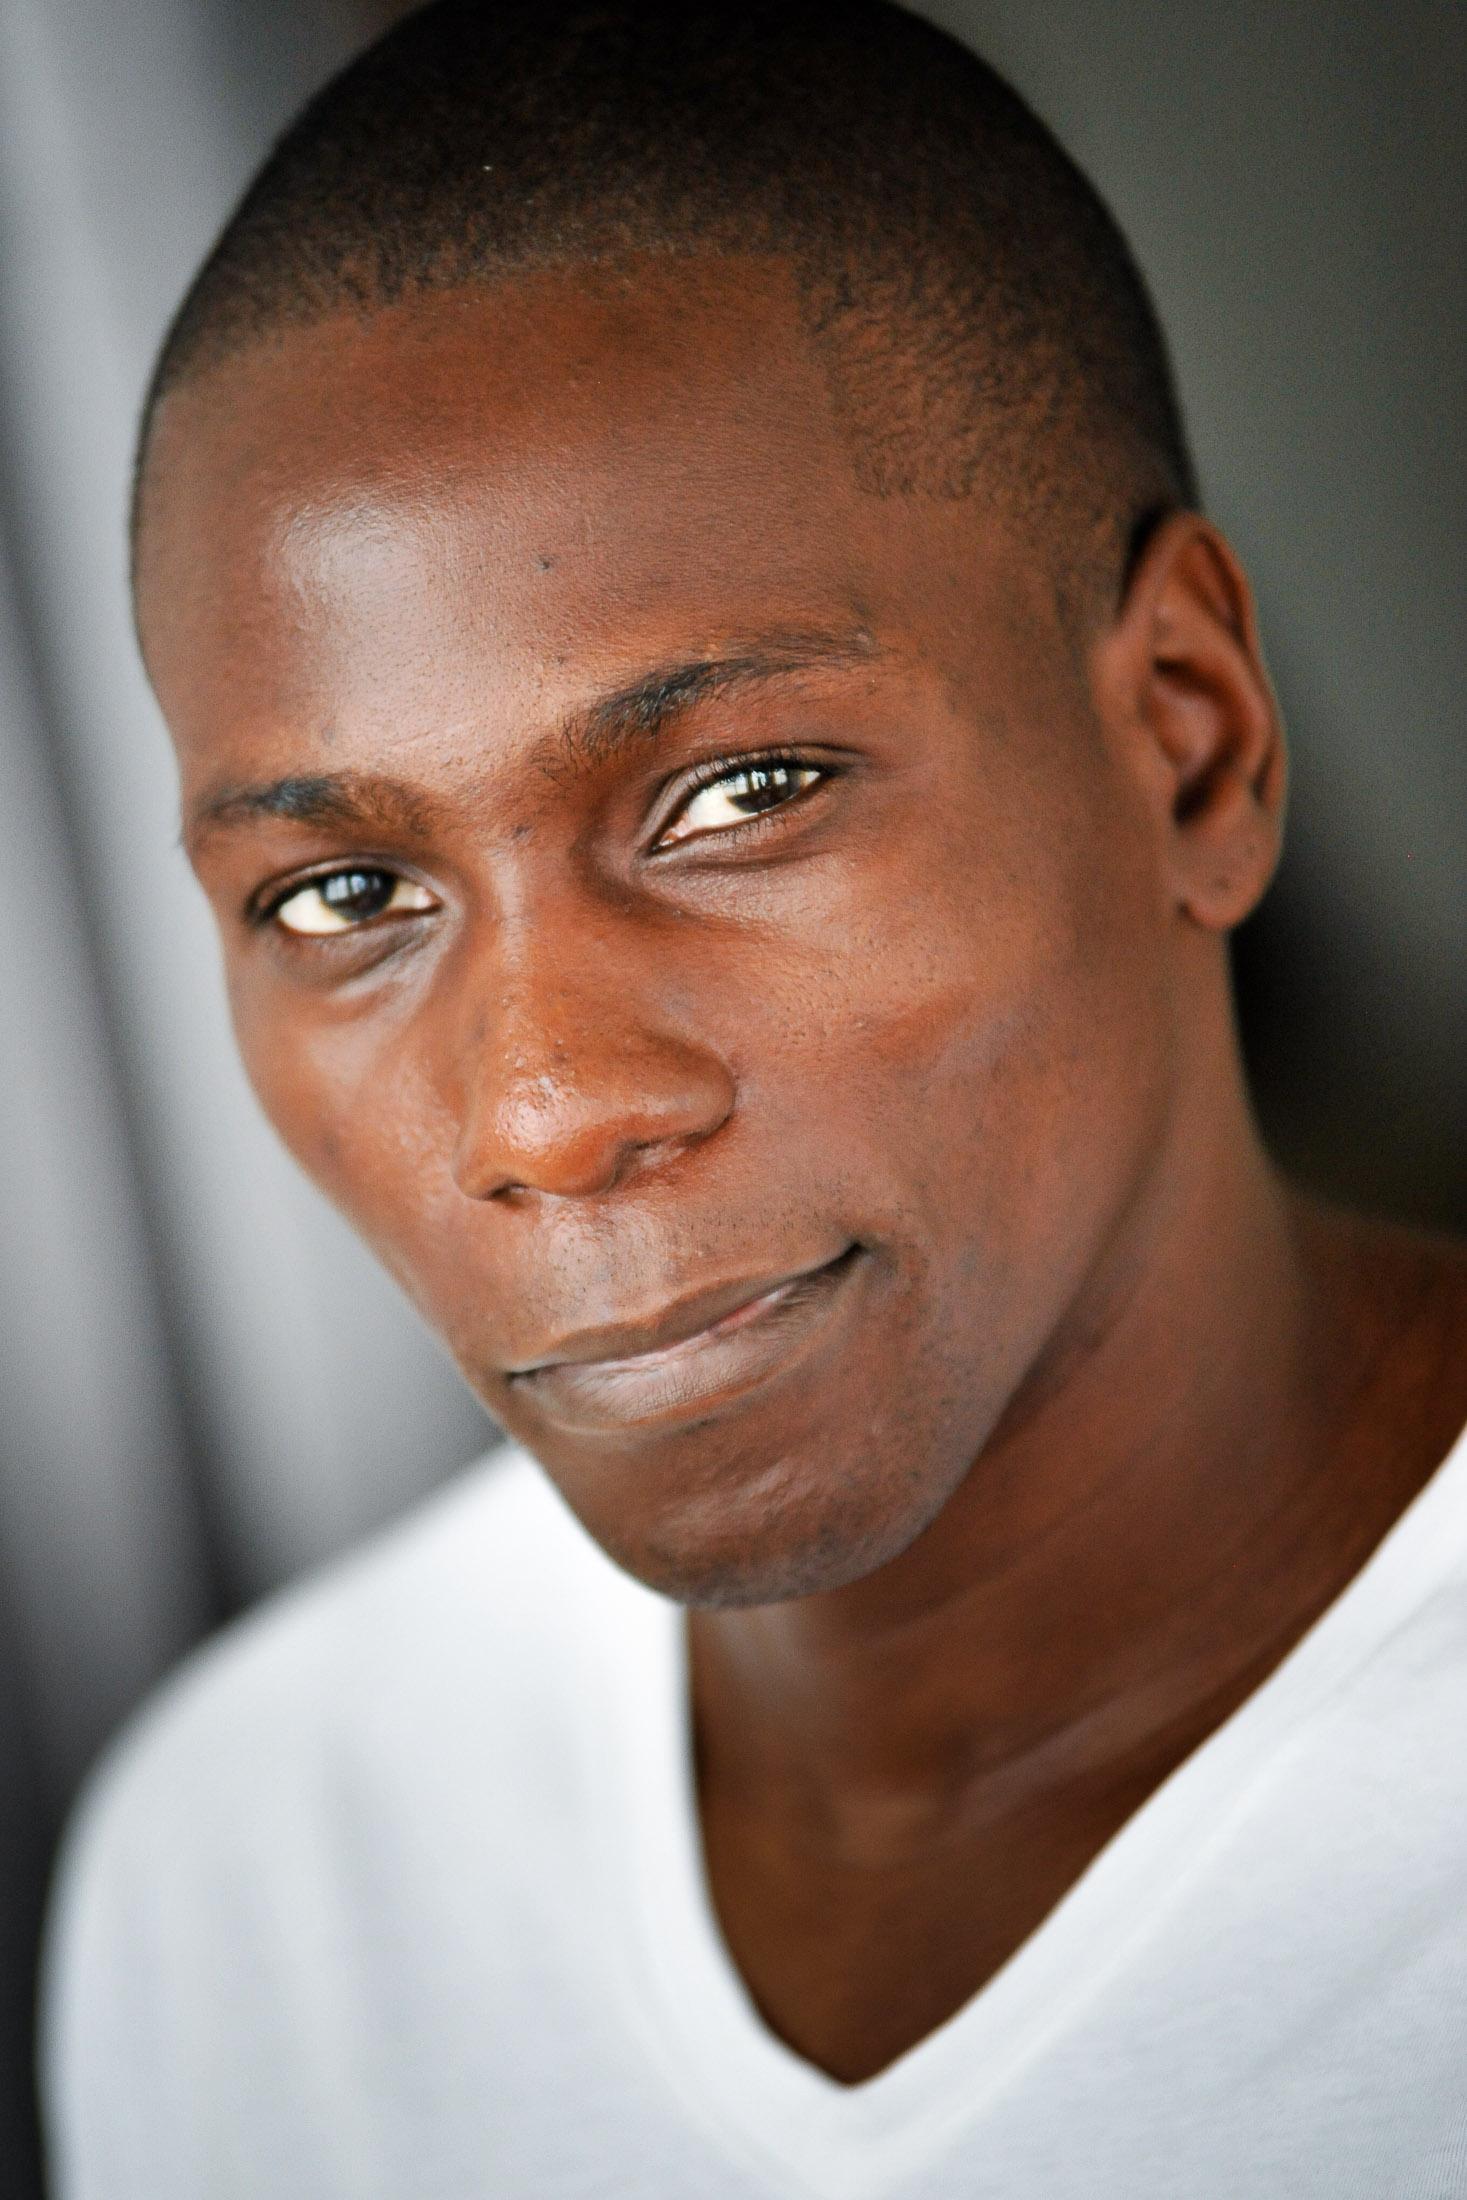 Headshots NYC - Actor Headshots Yacine D